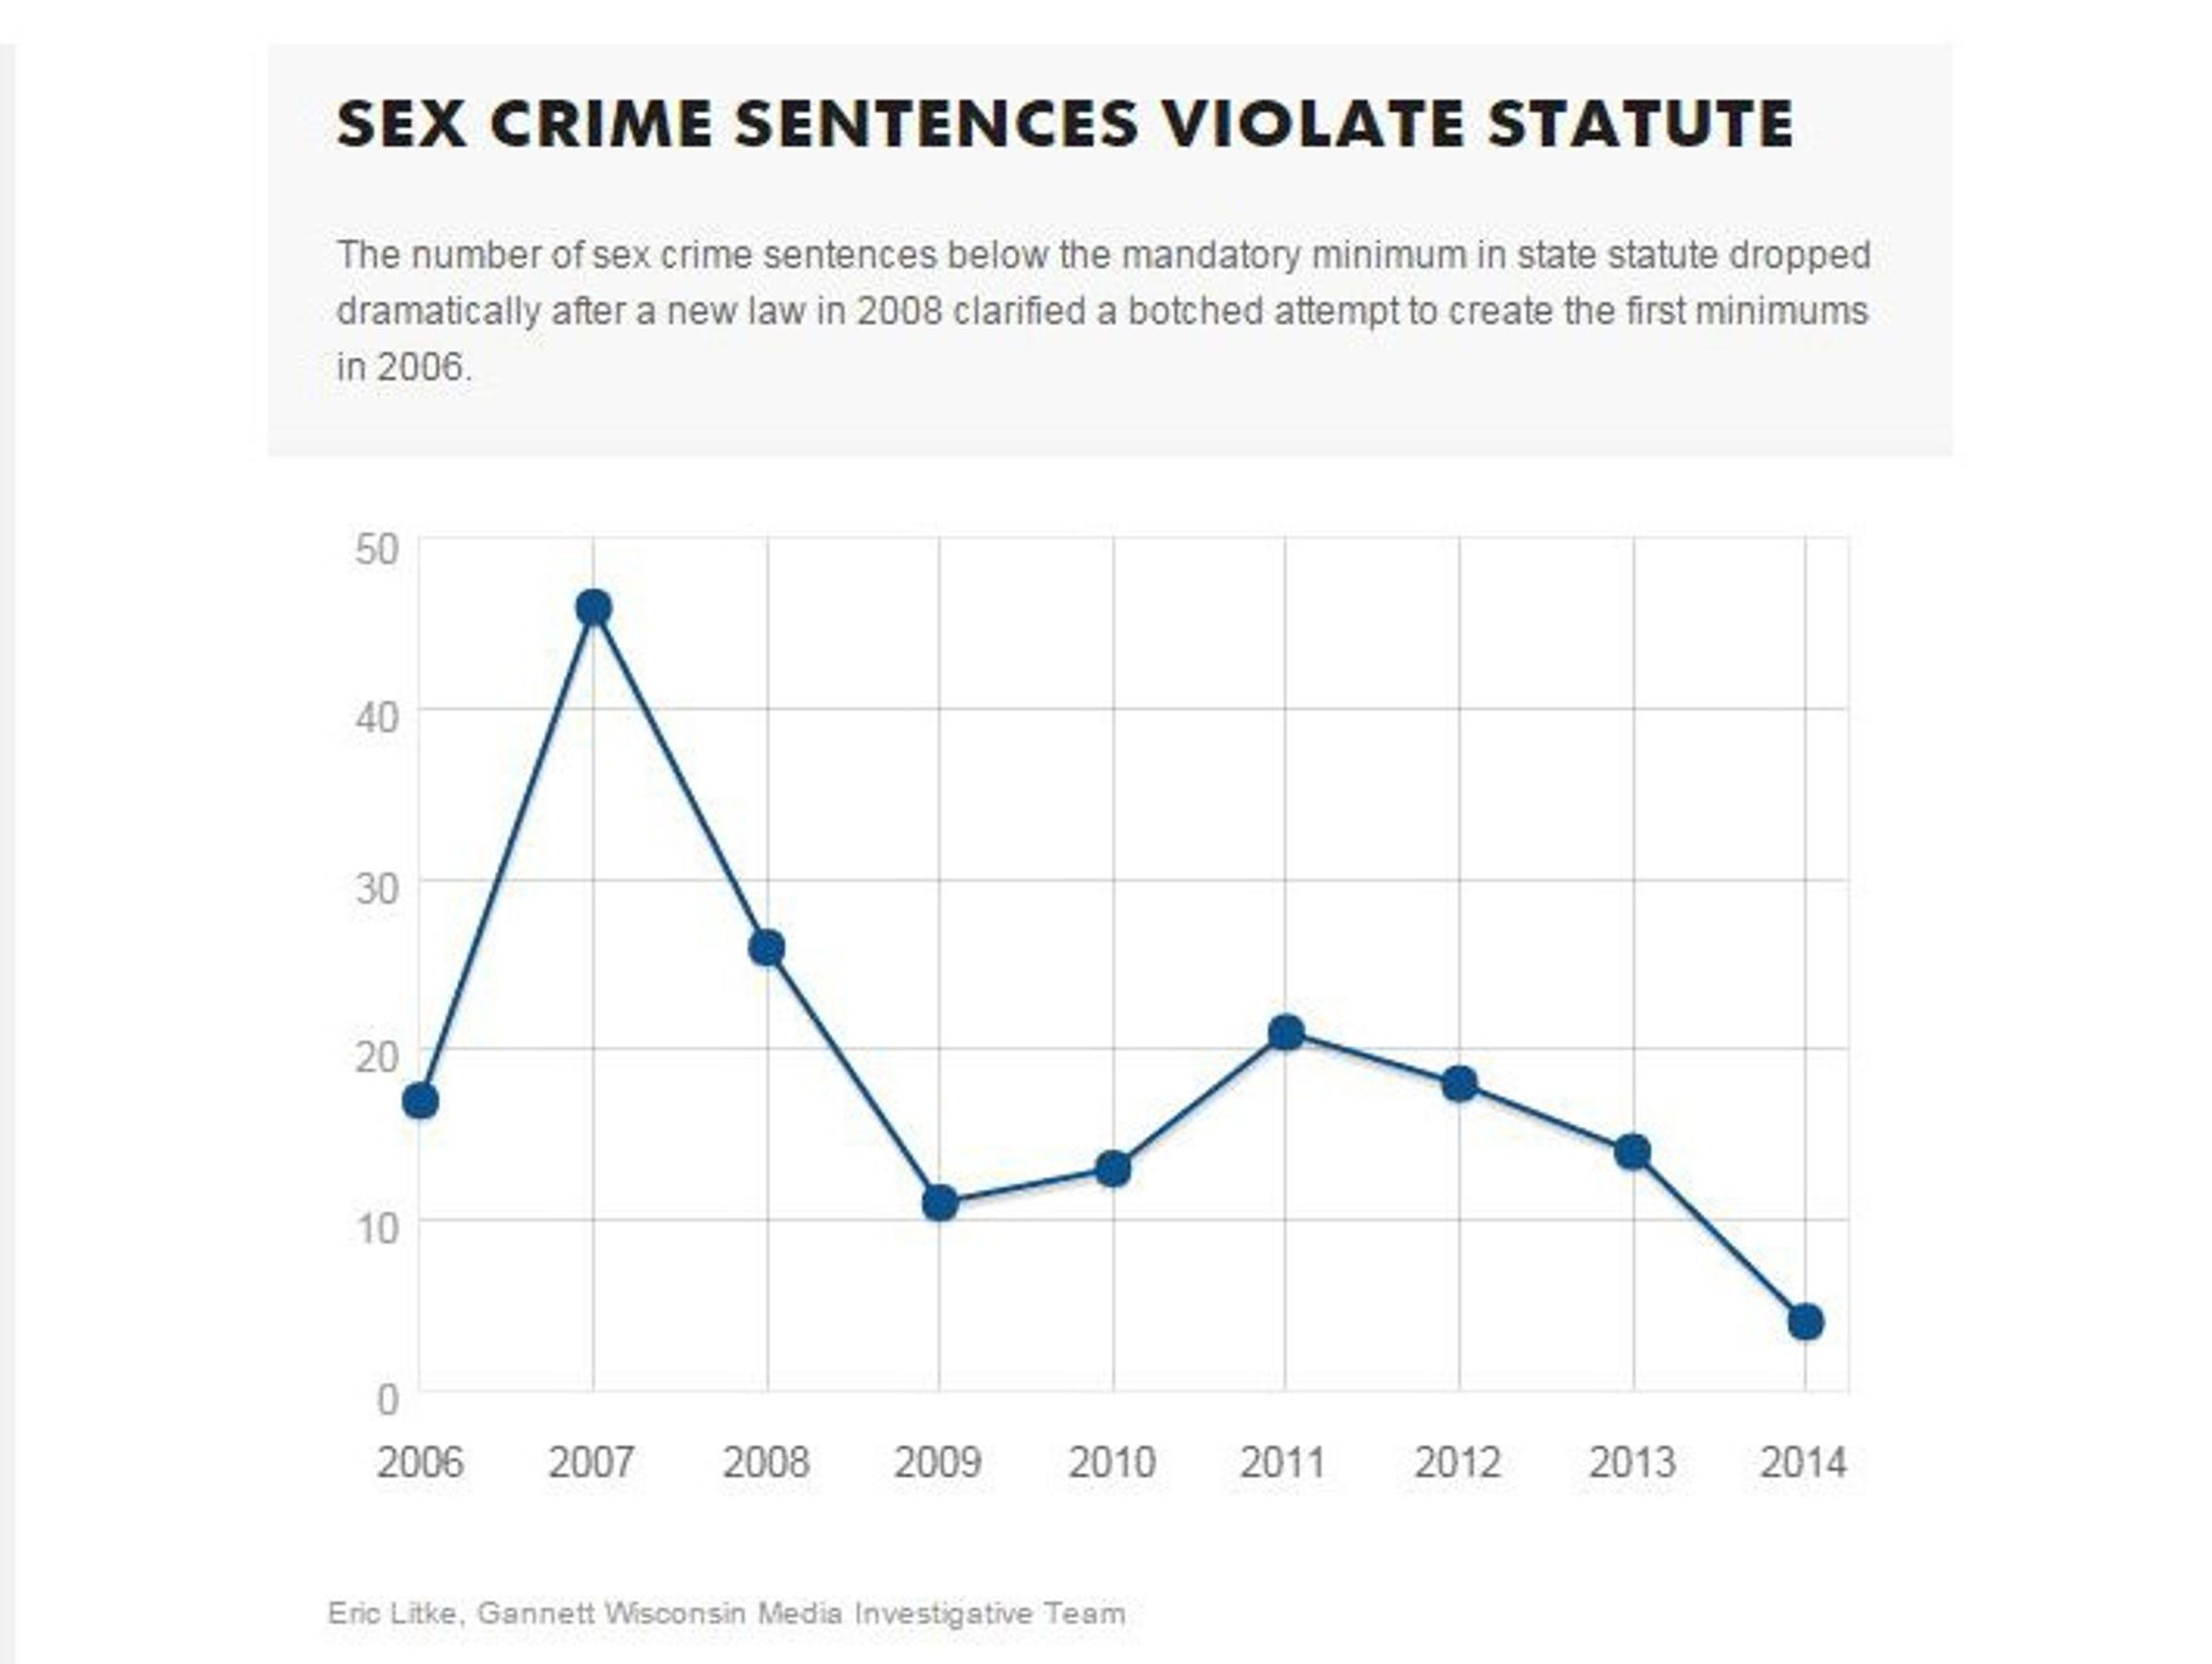 Sex crime sentences violate statute